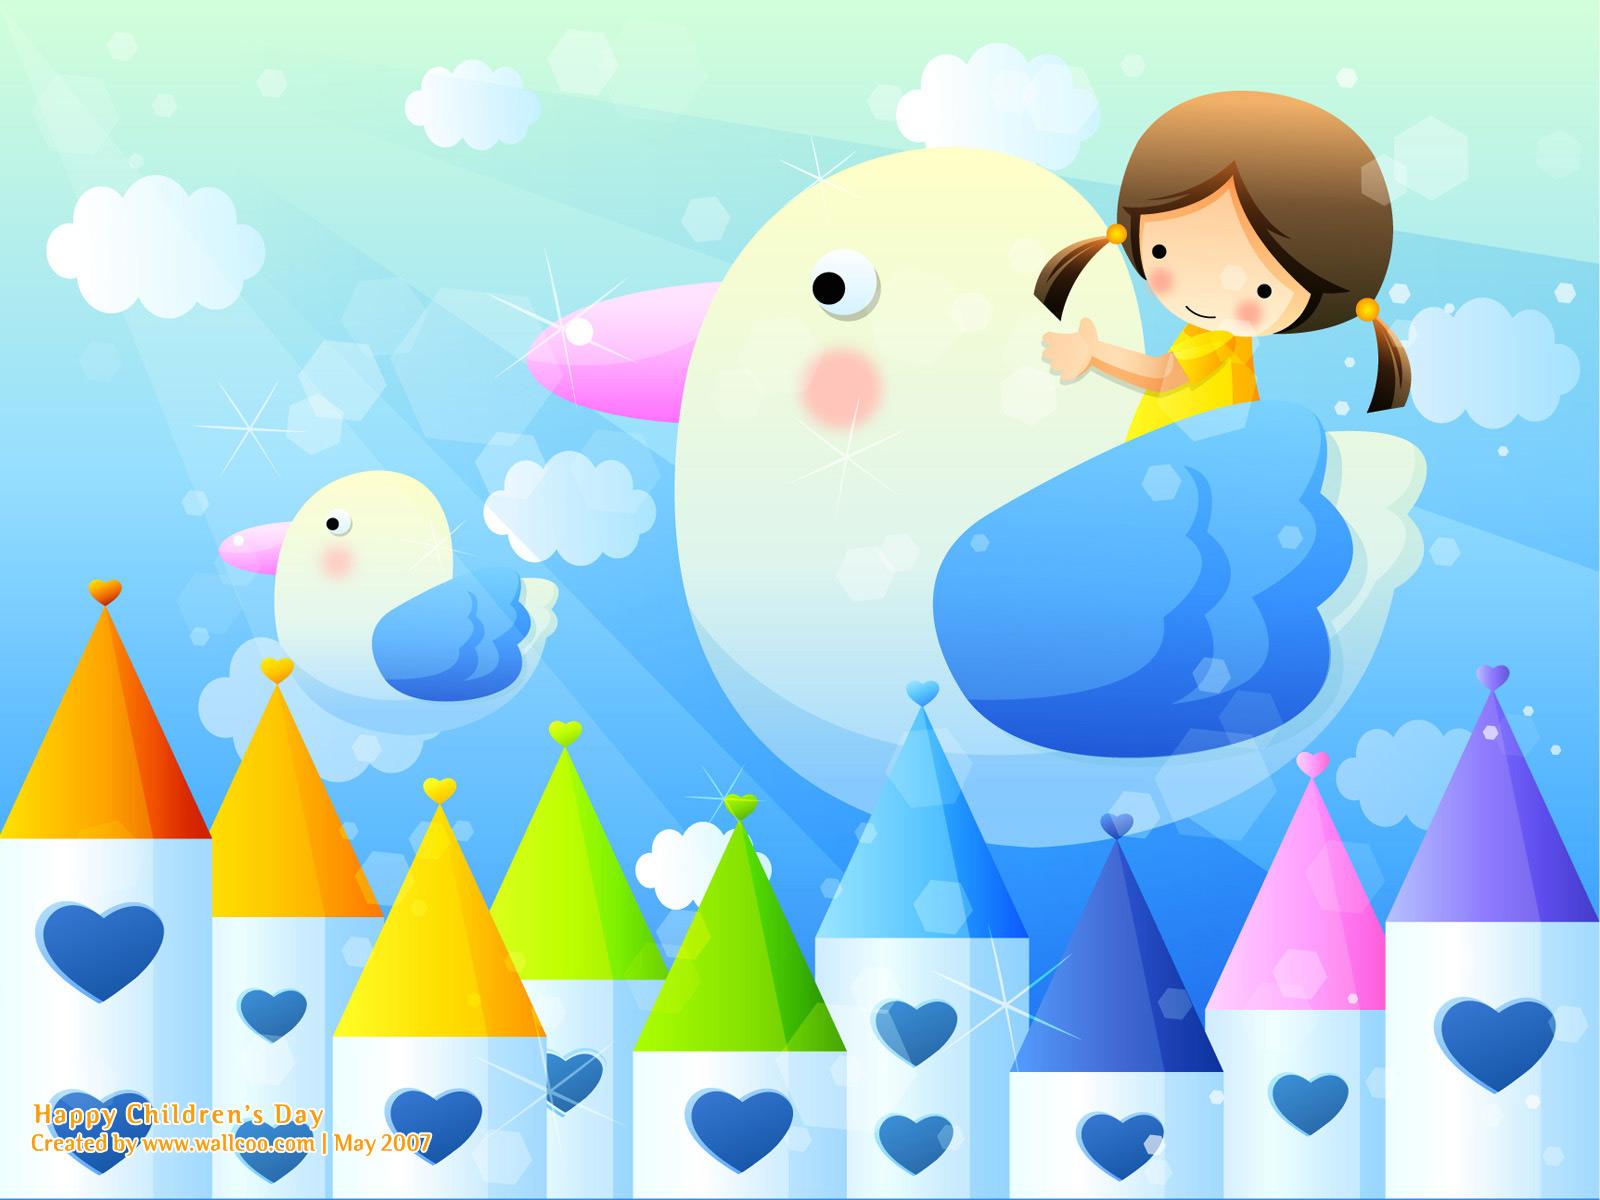 Childrens Day Wallpaper Greetings KidsFunDrawingArt 1600x1200